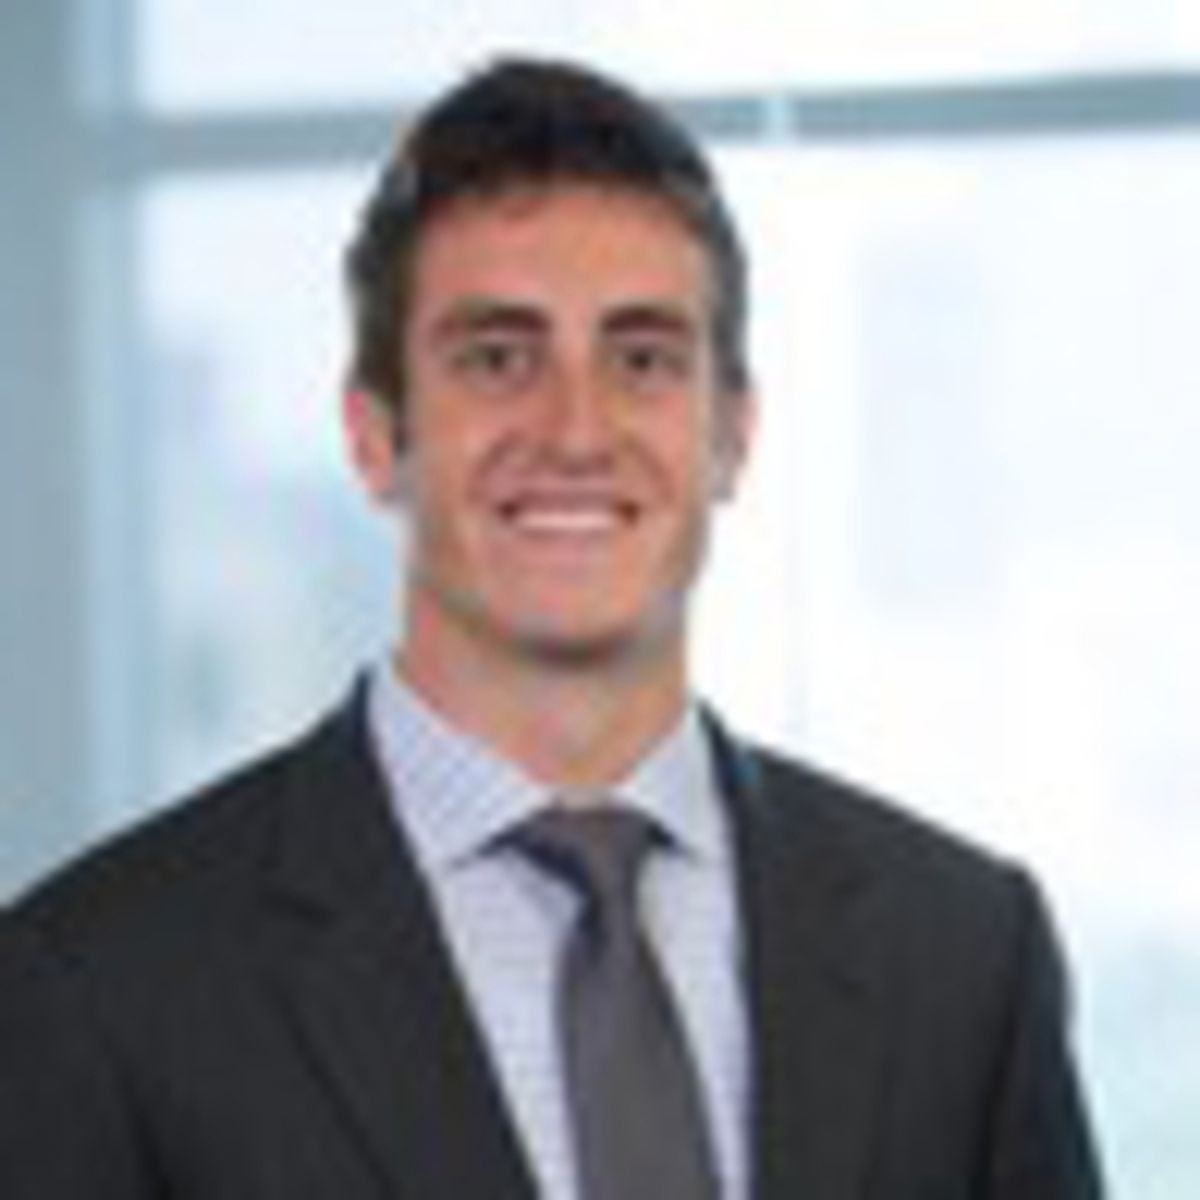 Photo of Robert Mlnarik, Senior Associate at Summit Partners